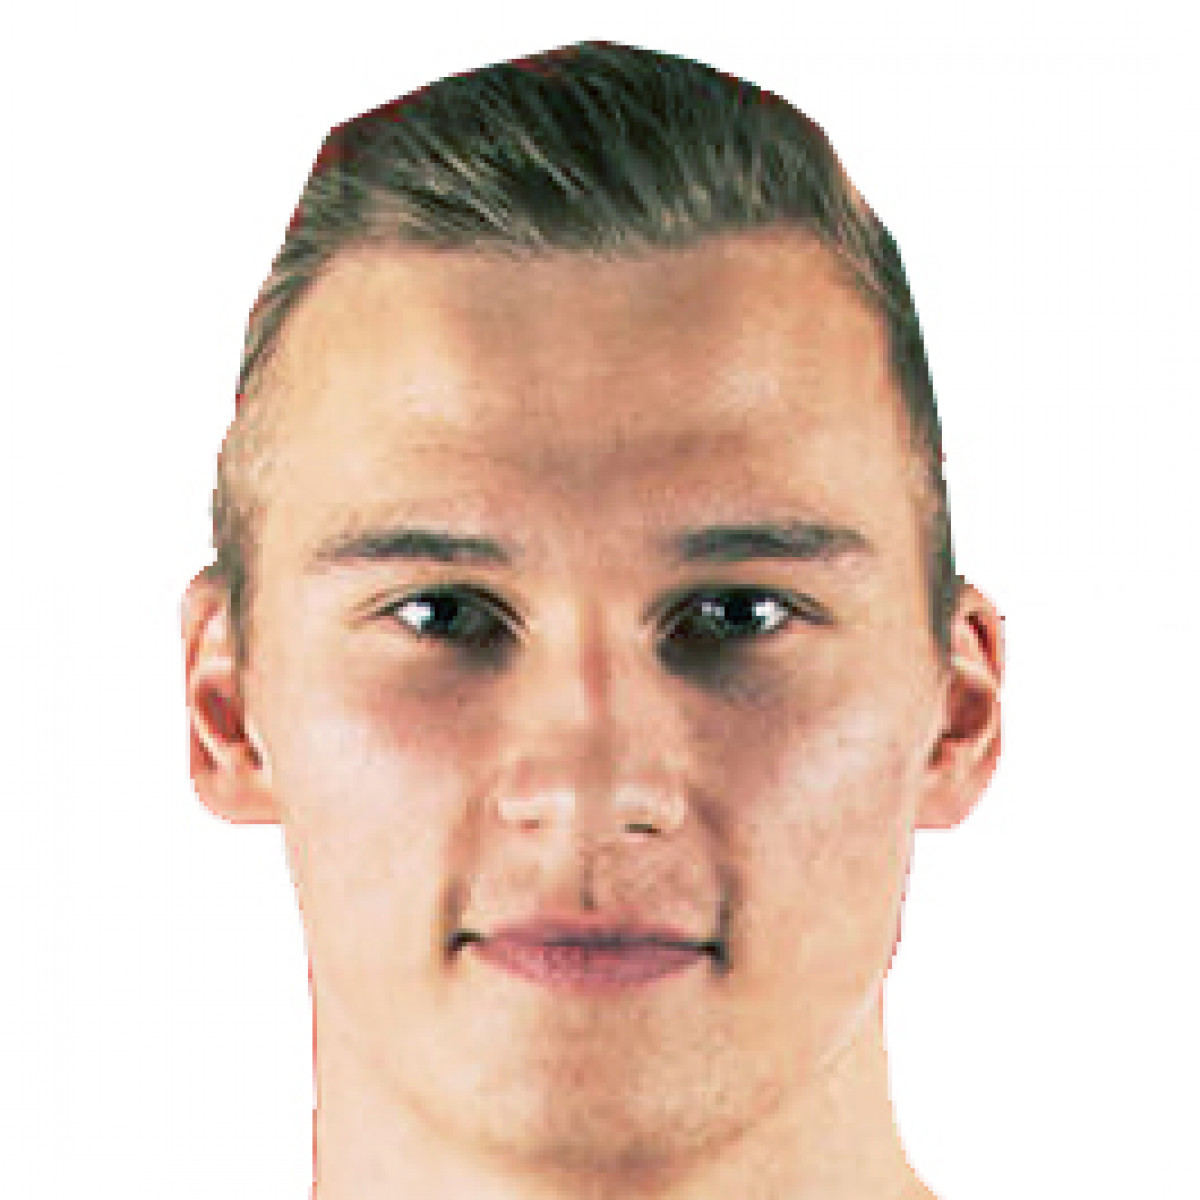 Justus Kilpinen